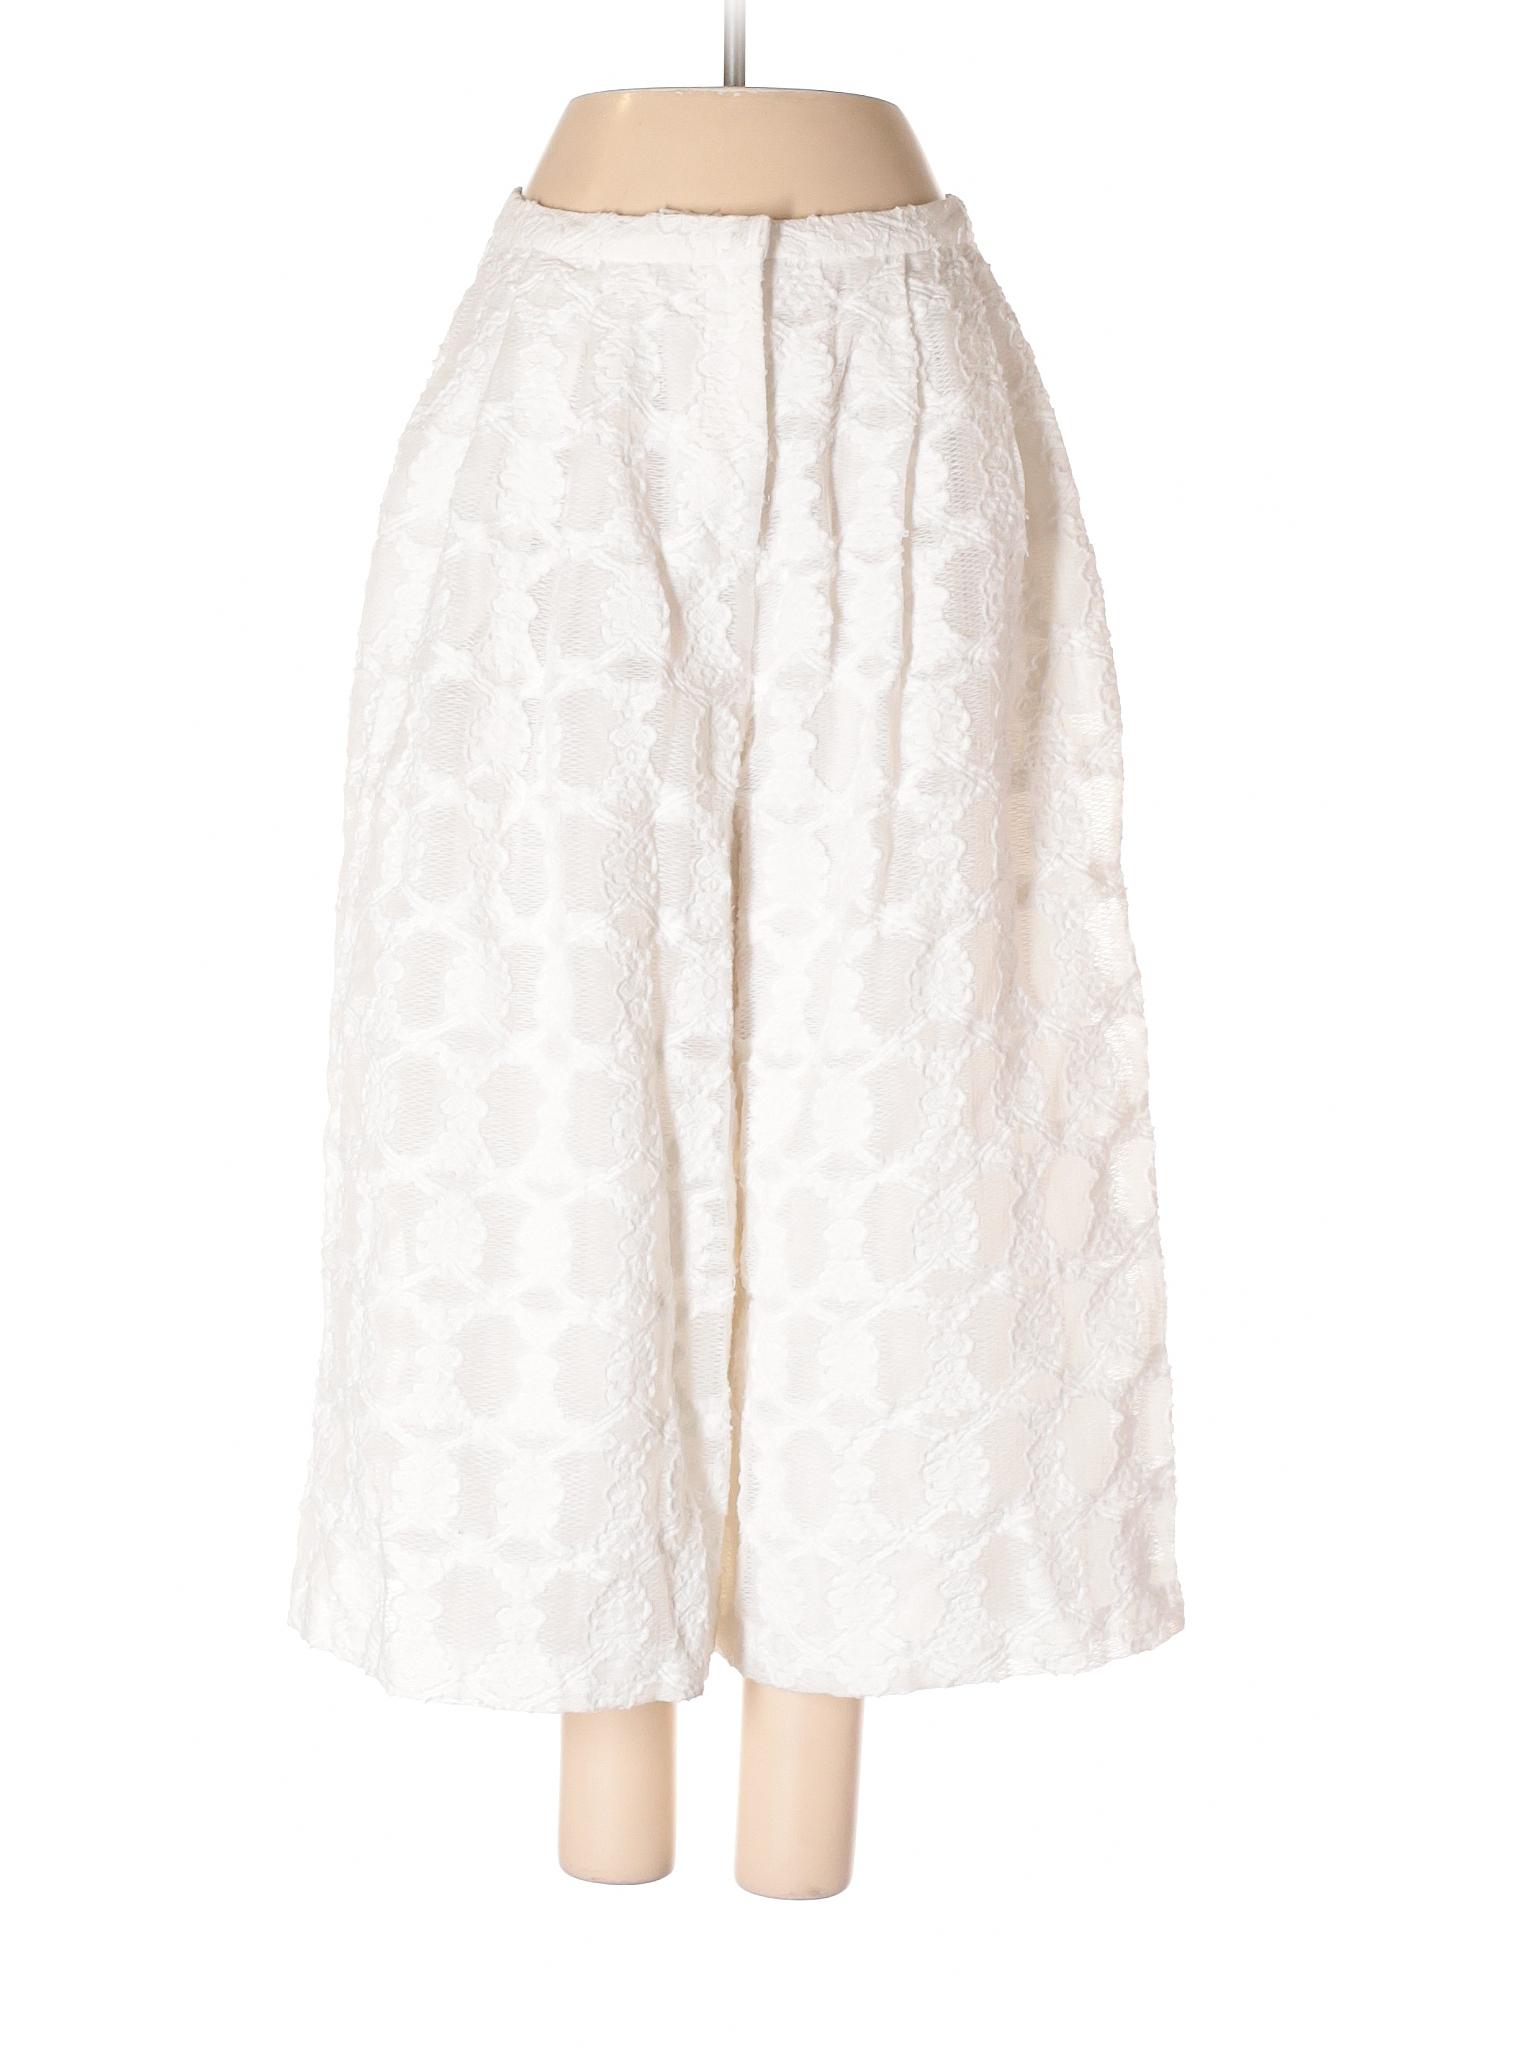 9dc006b006ff Champagne   Strawberry Casual Pants  Size 4.00 White Women s Bottoms -   11.99